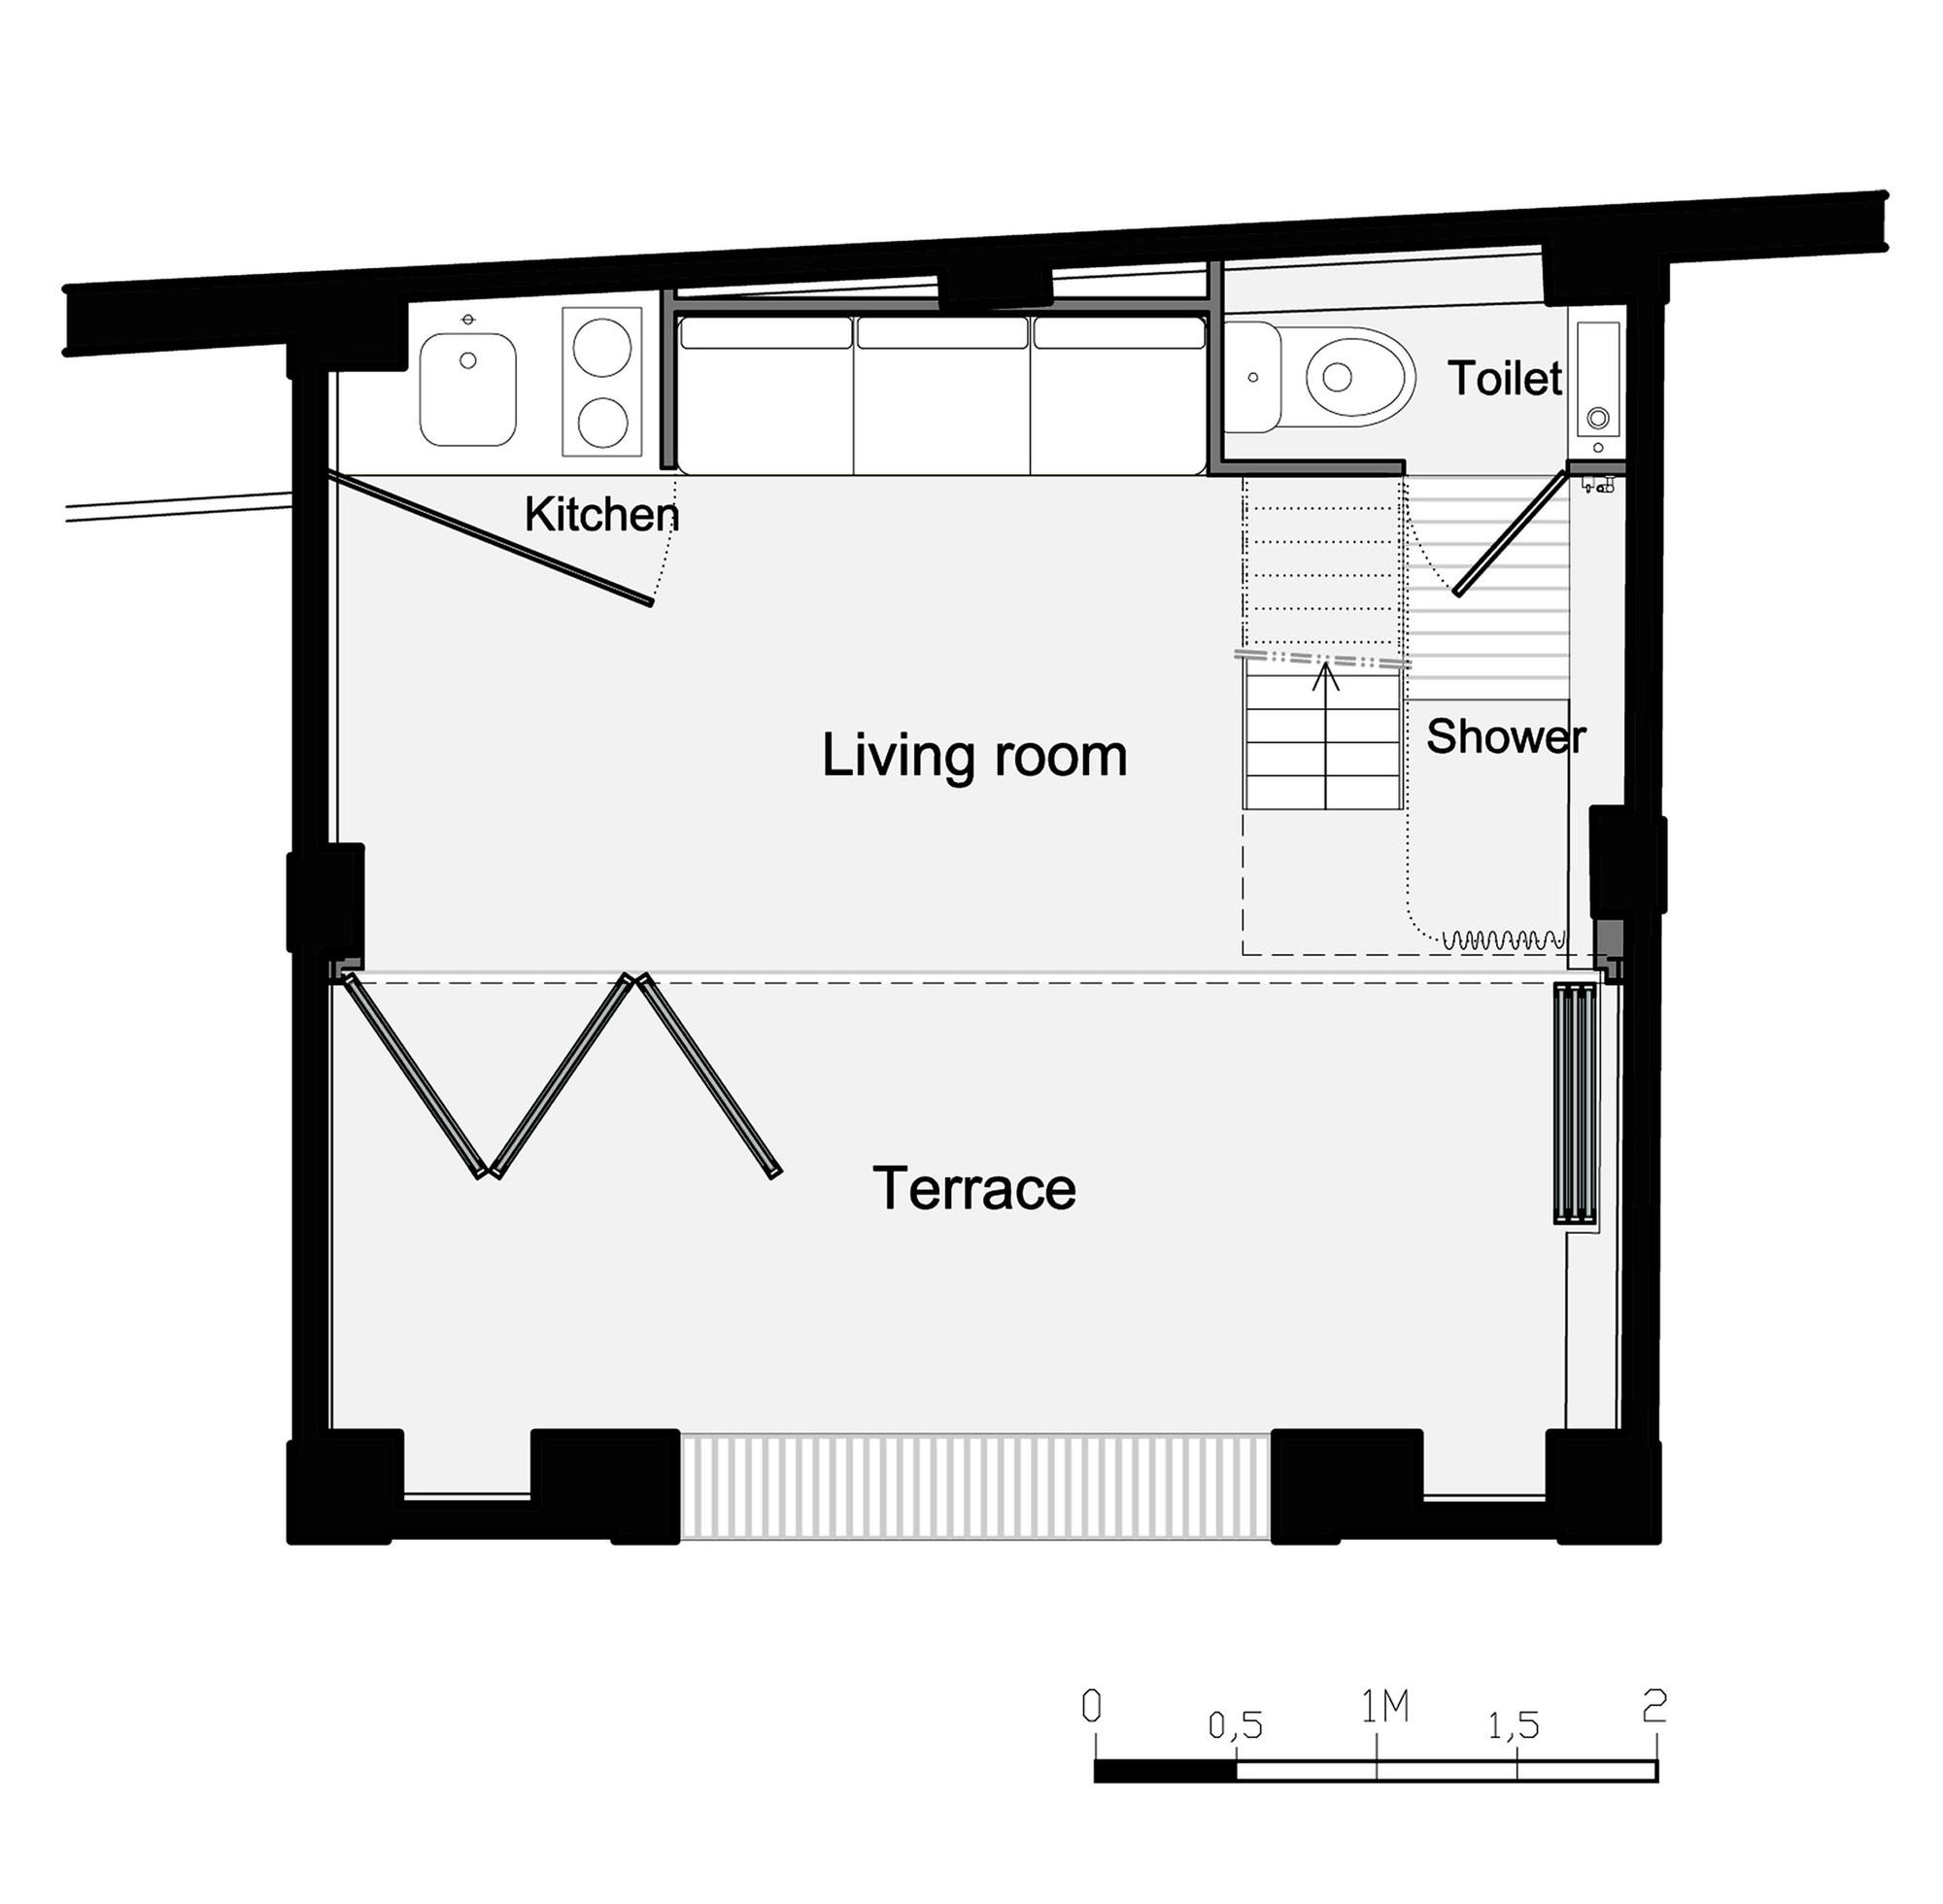 Pavillon d 39 t no mie meney archdaily for Plan pavillon moderne